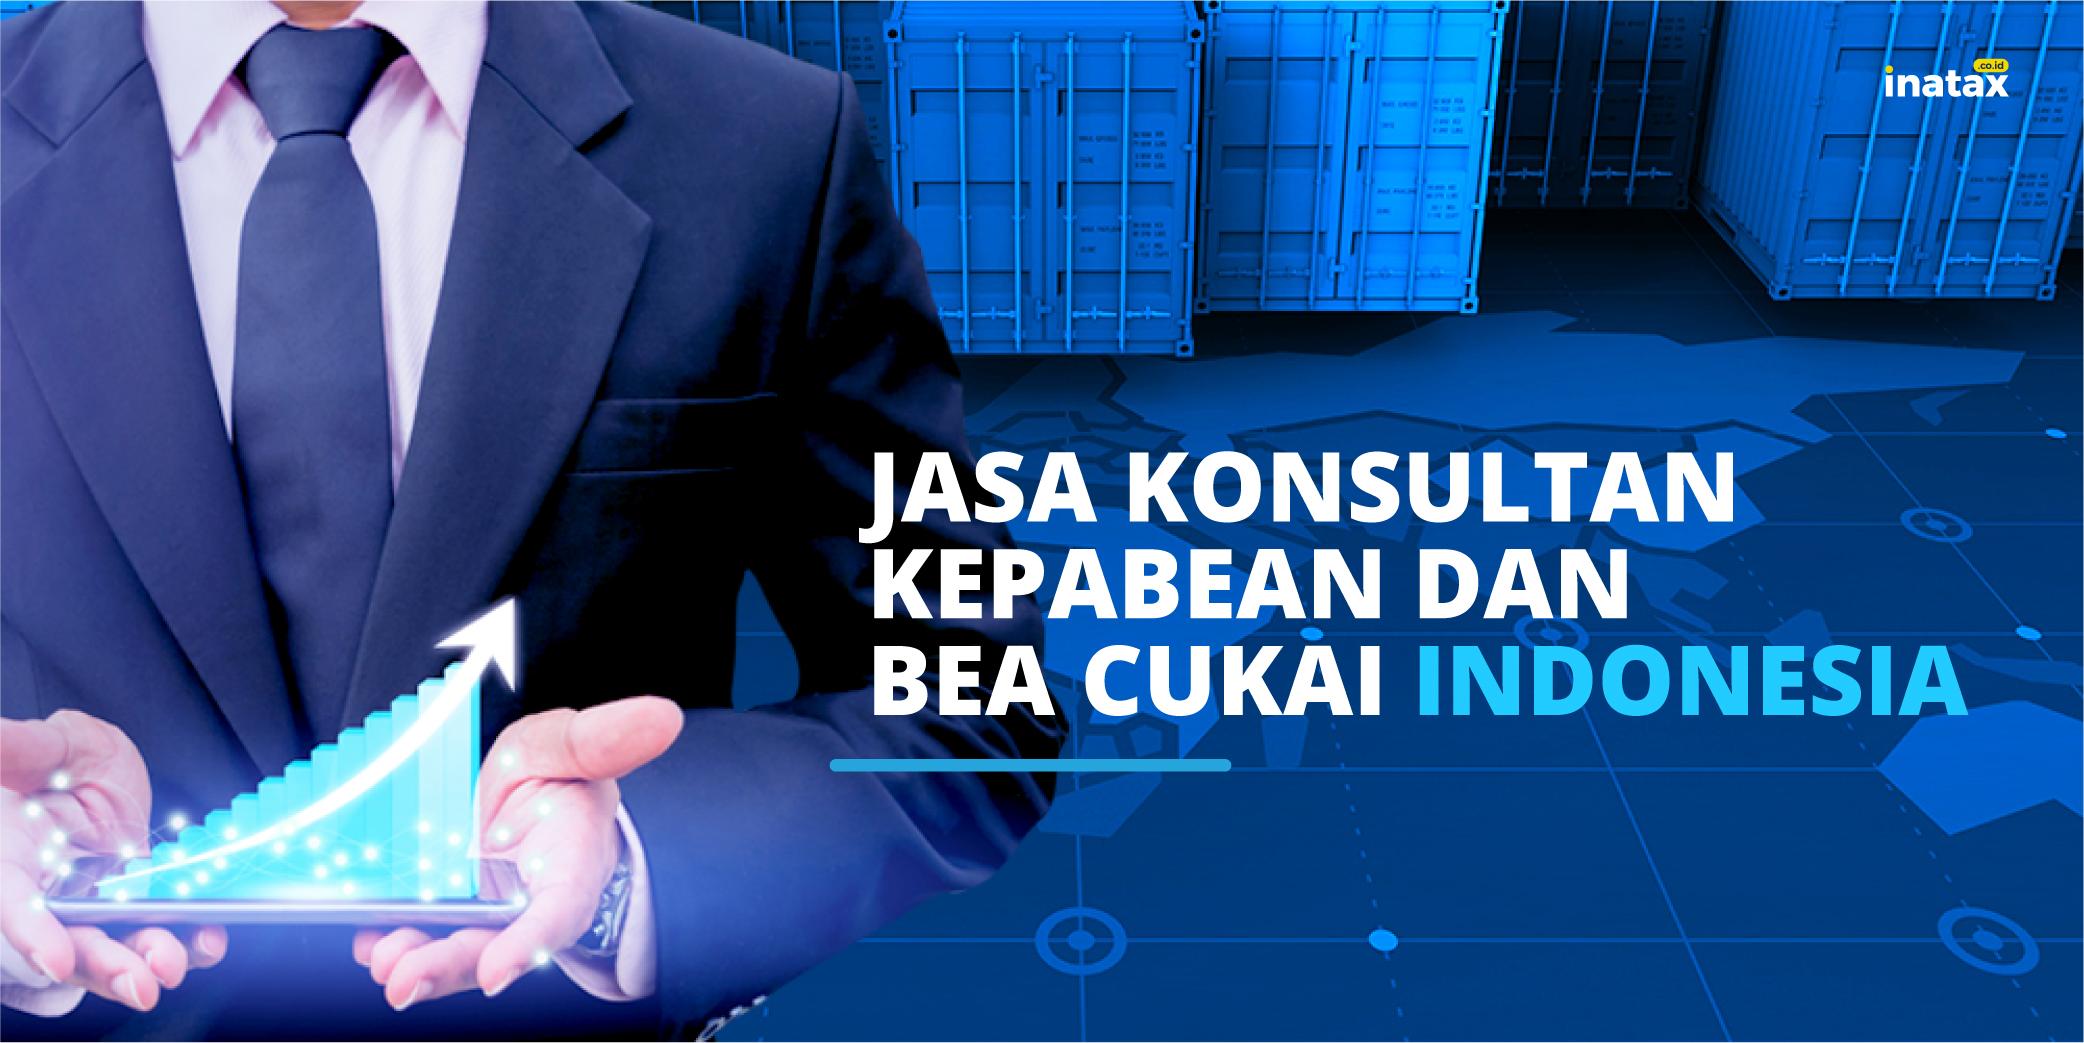 Jasa Konsultan Pabean dan Bea Cukai Indonesia